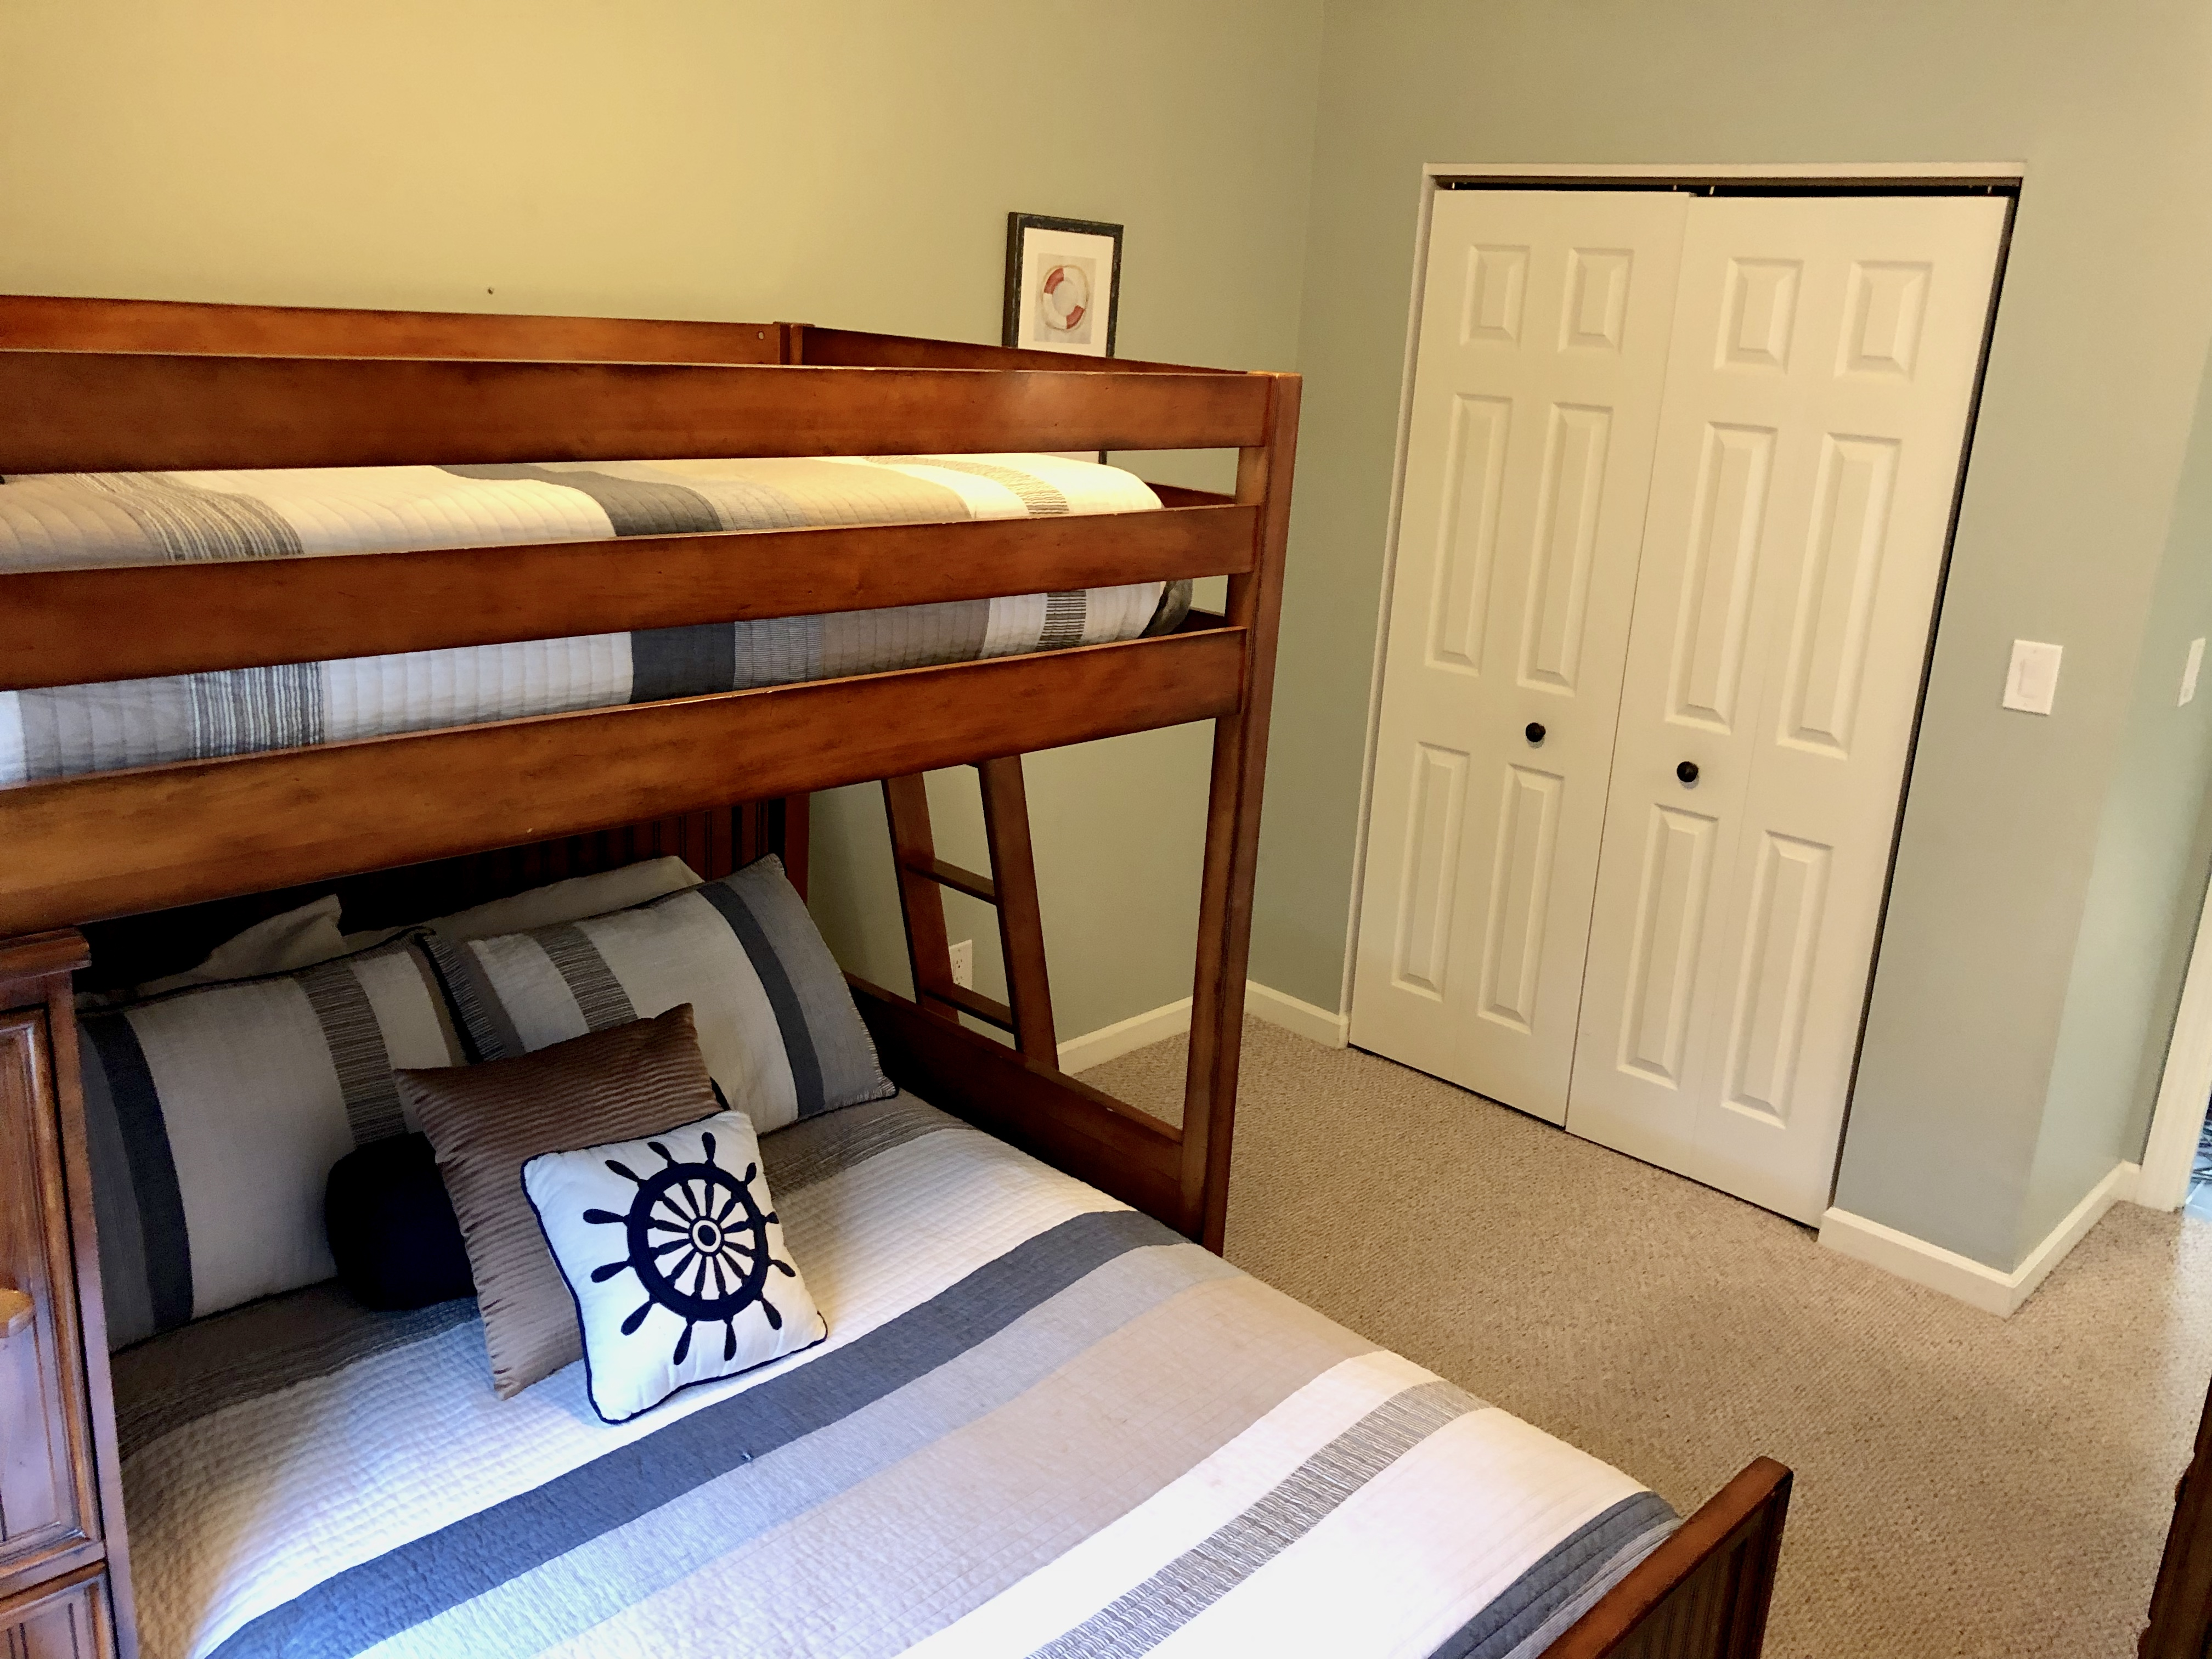 KI Guest Room 2